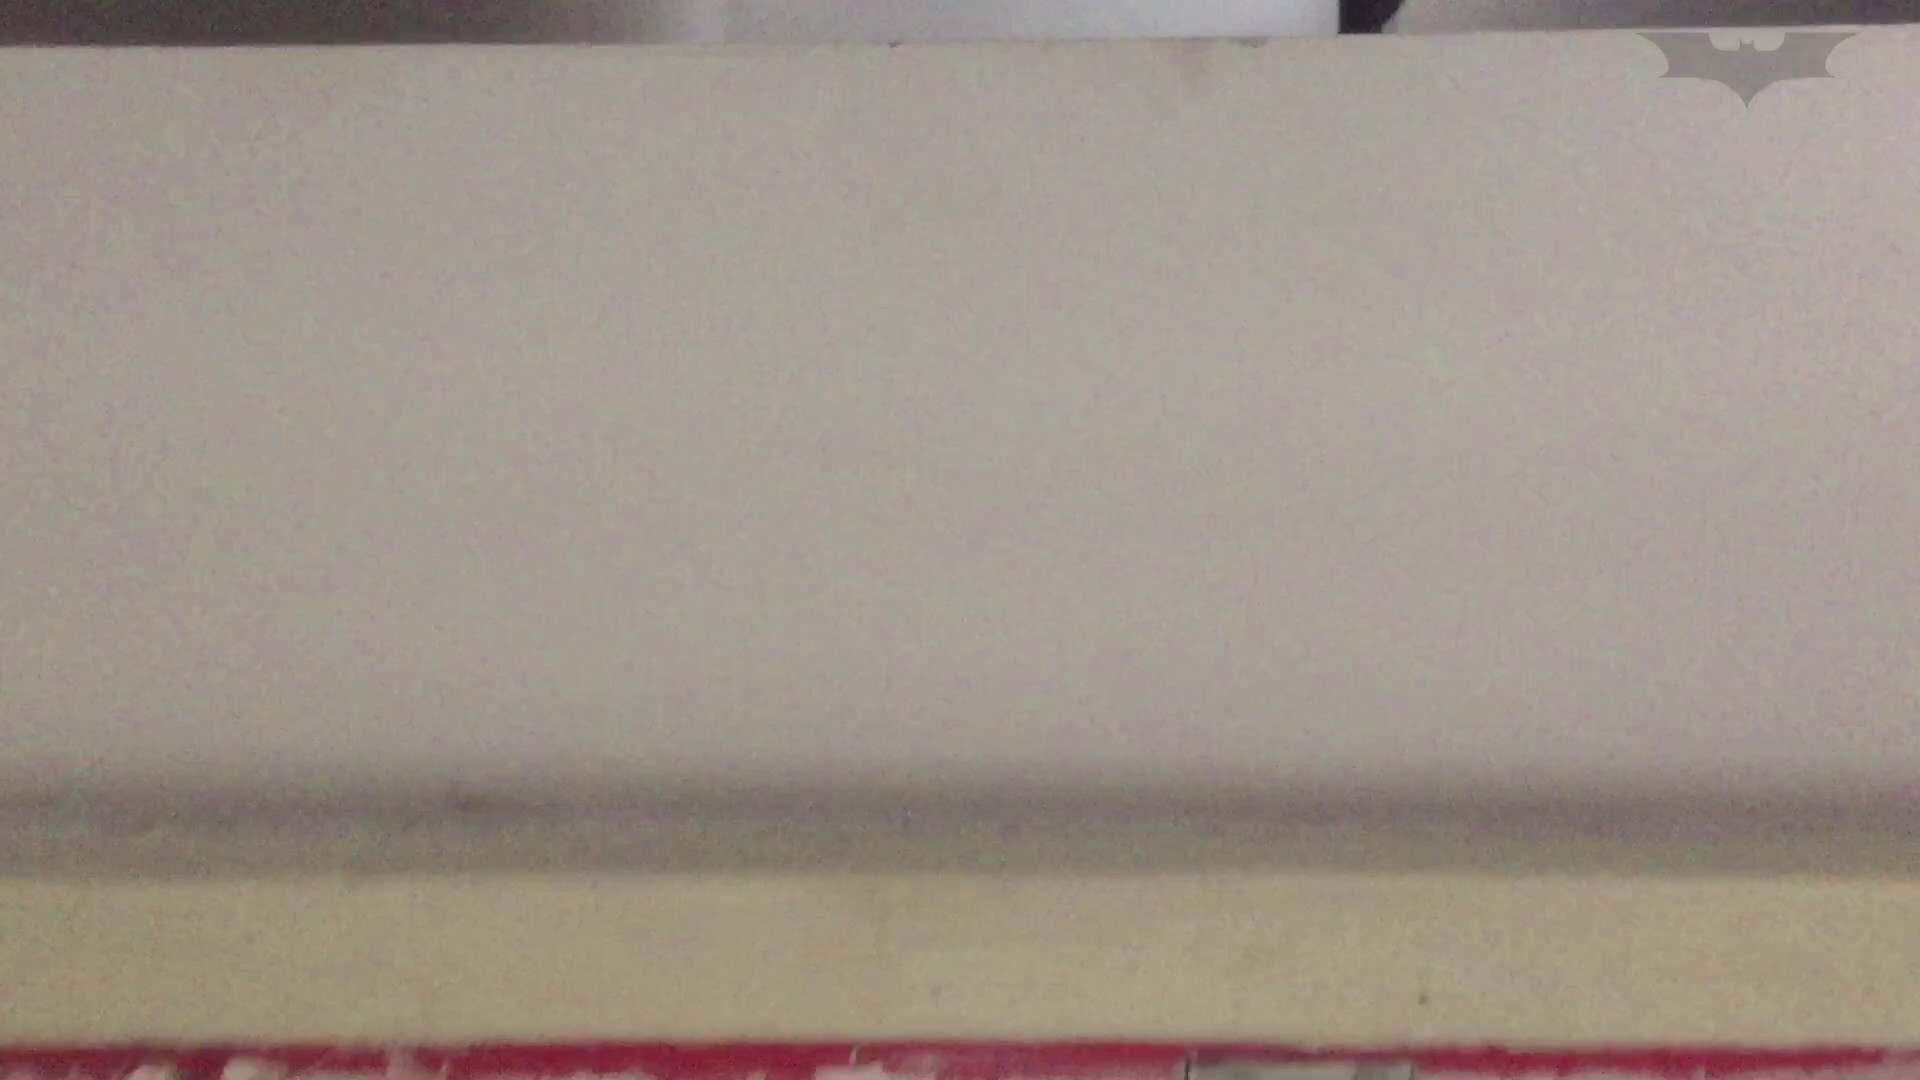 JD盗撮 美女の洗面所の秘密 Vol.73 丸見え ヌード画像 105画像 43